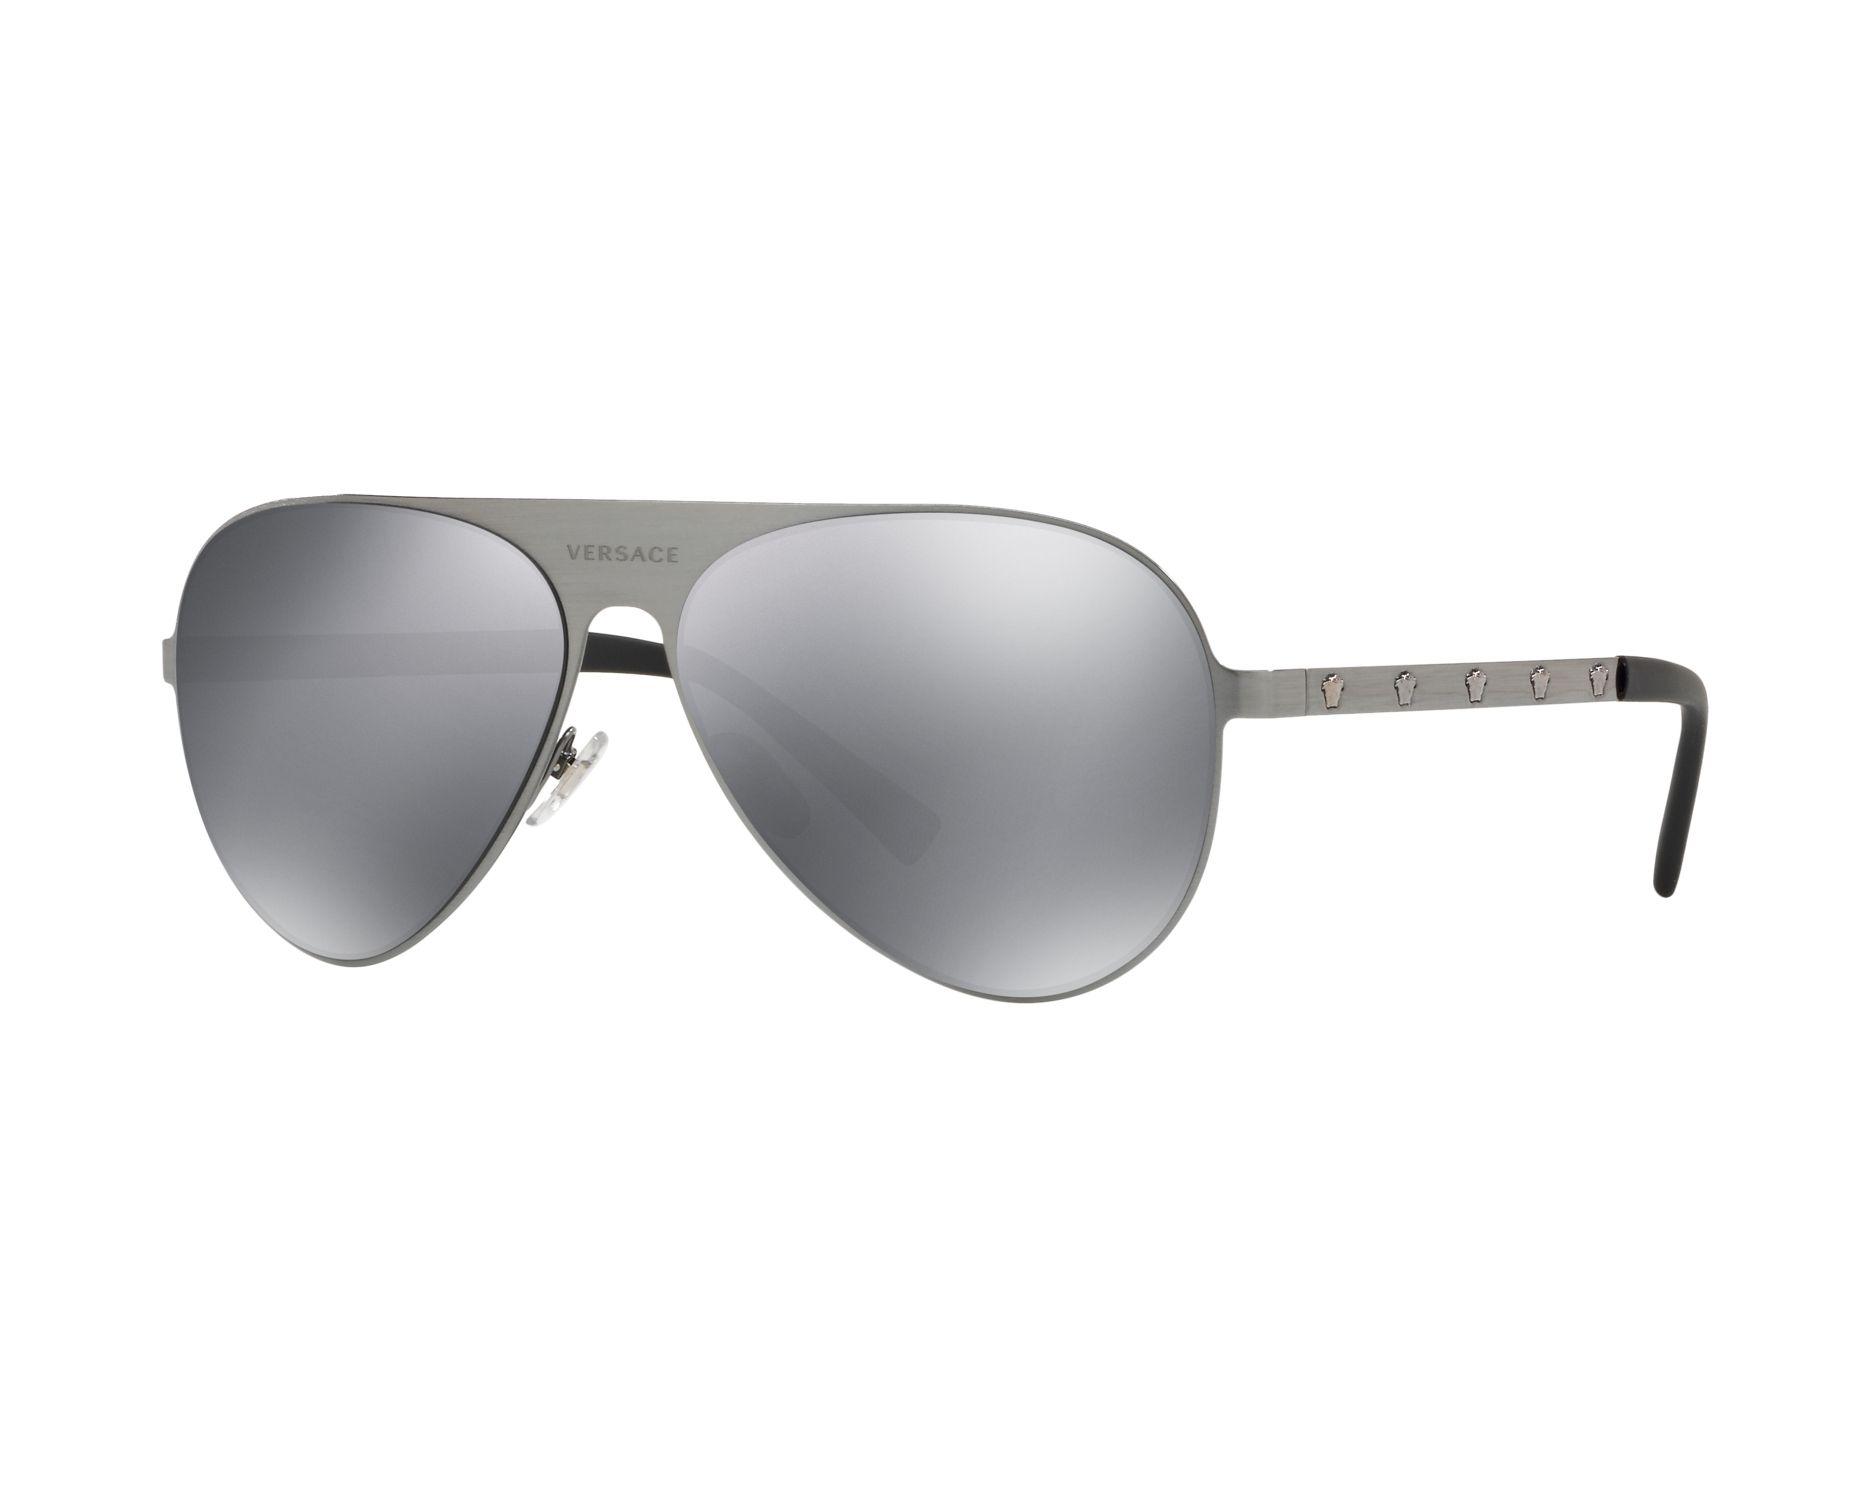 Versace Sonnenbrille » VE2189«, grau, 12626G - grau/schwarz